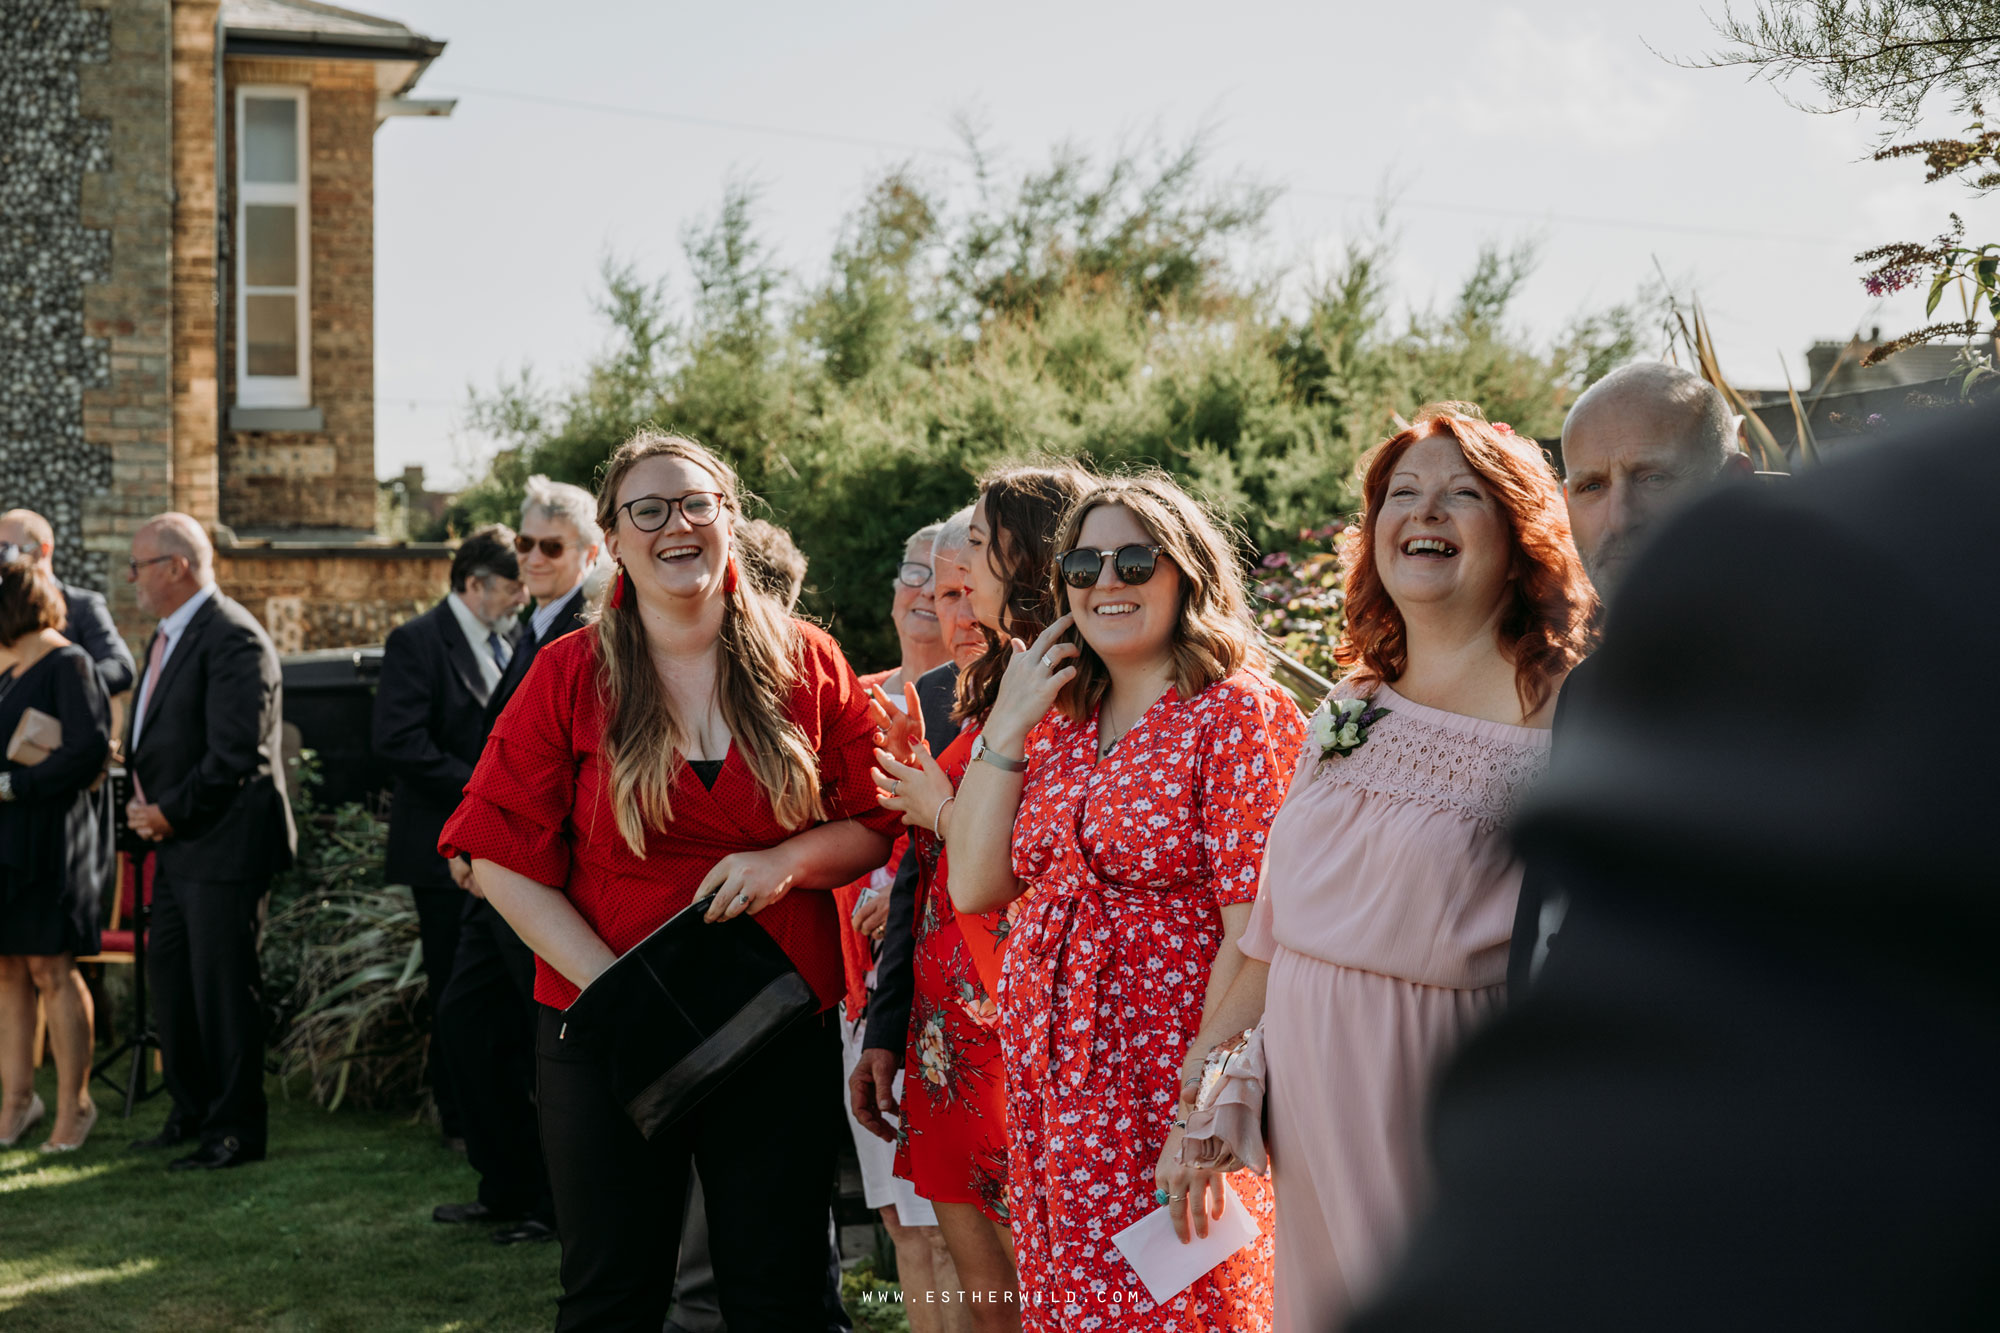 Cromer_Wedding_Beach_Outdoor_Ceremony_Norfolk_North_Lodge_Registry_Office_Rocket_House_Cafe_Cromer_Pier_IMG_3648.jpg